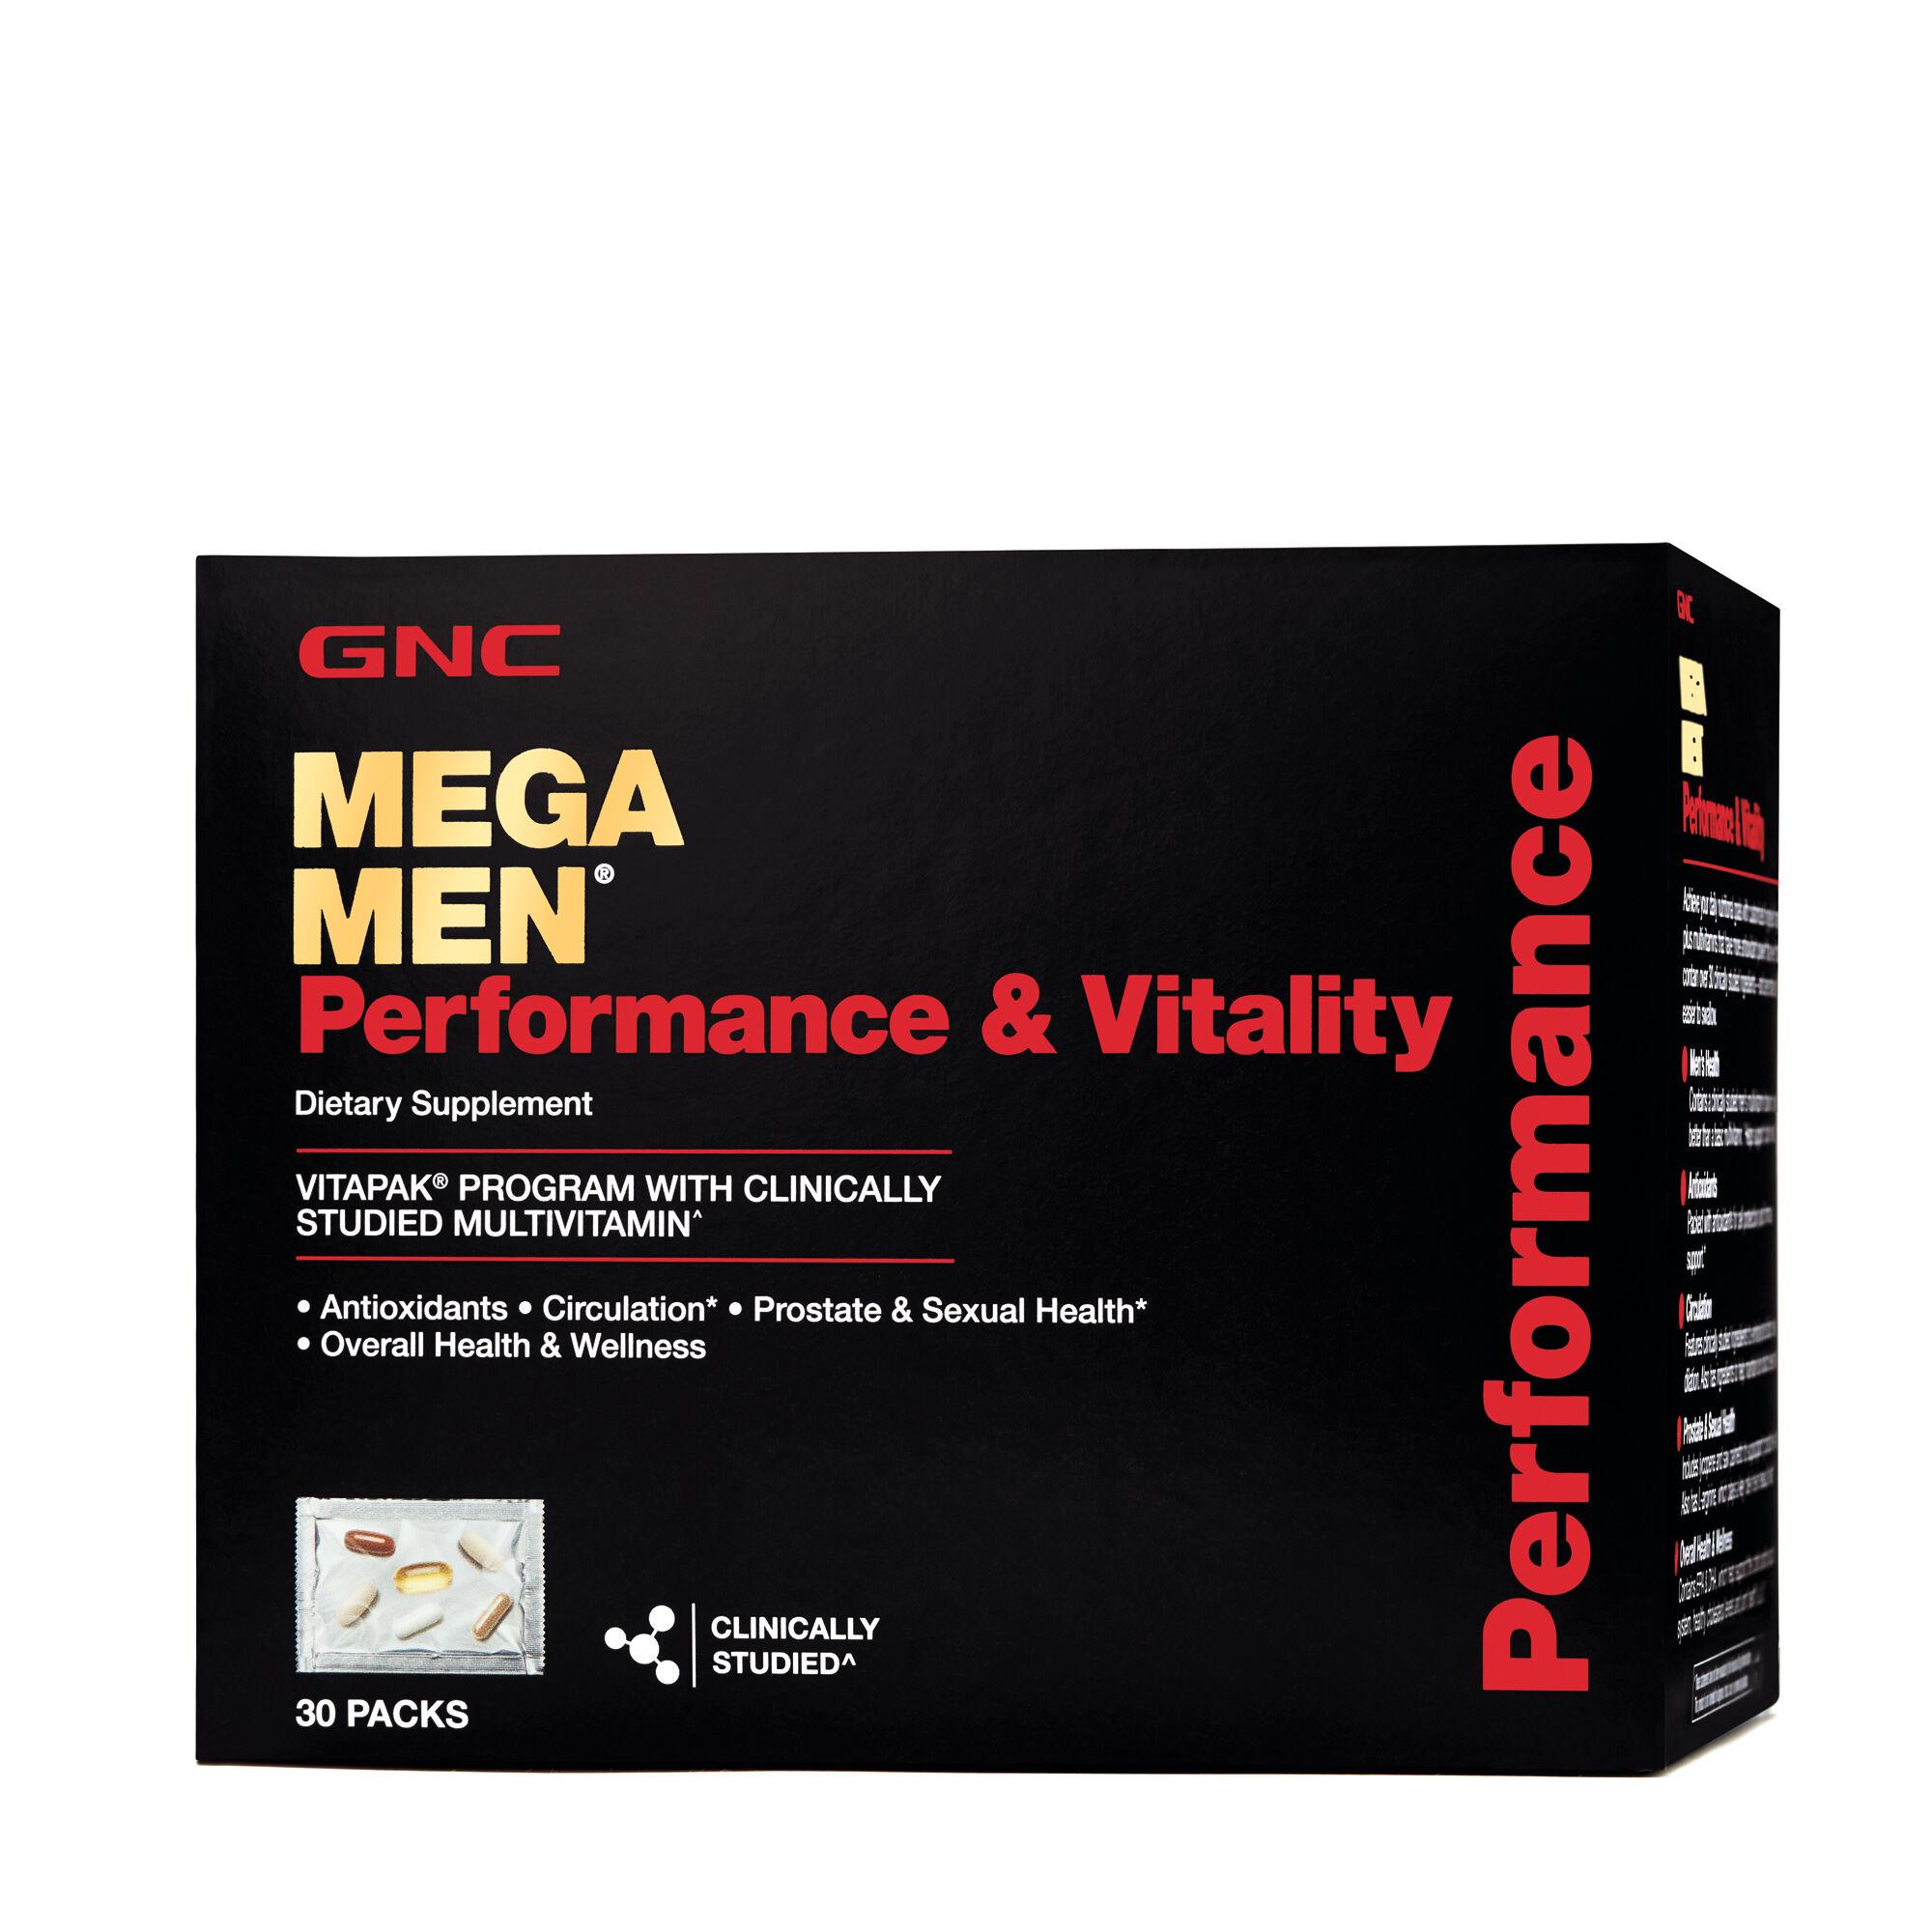 Multivitamin for men sexual health